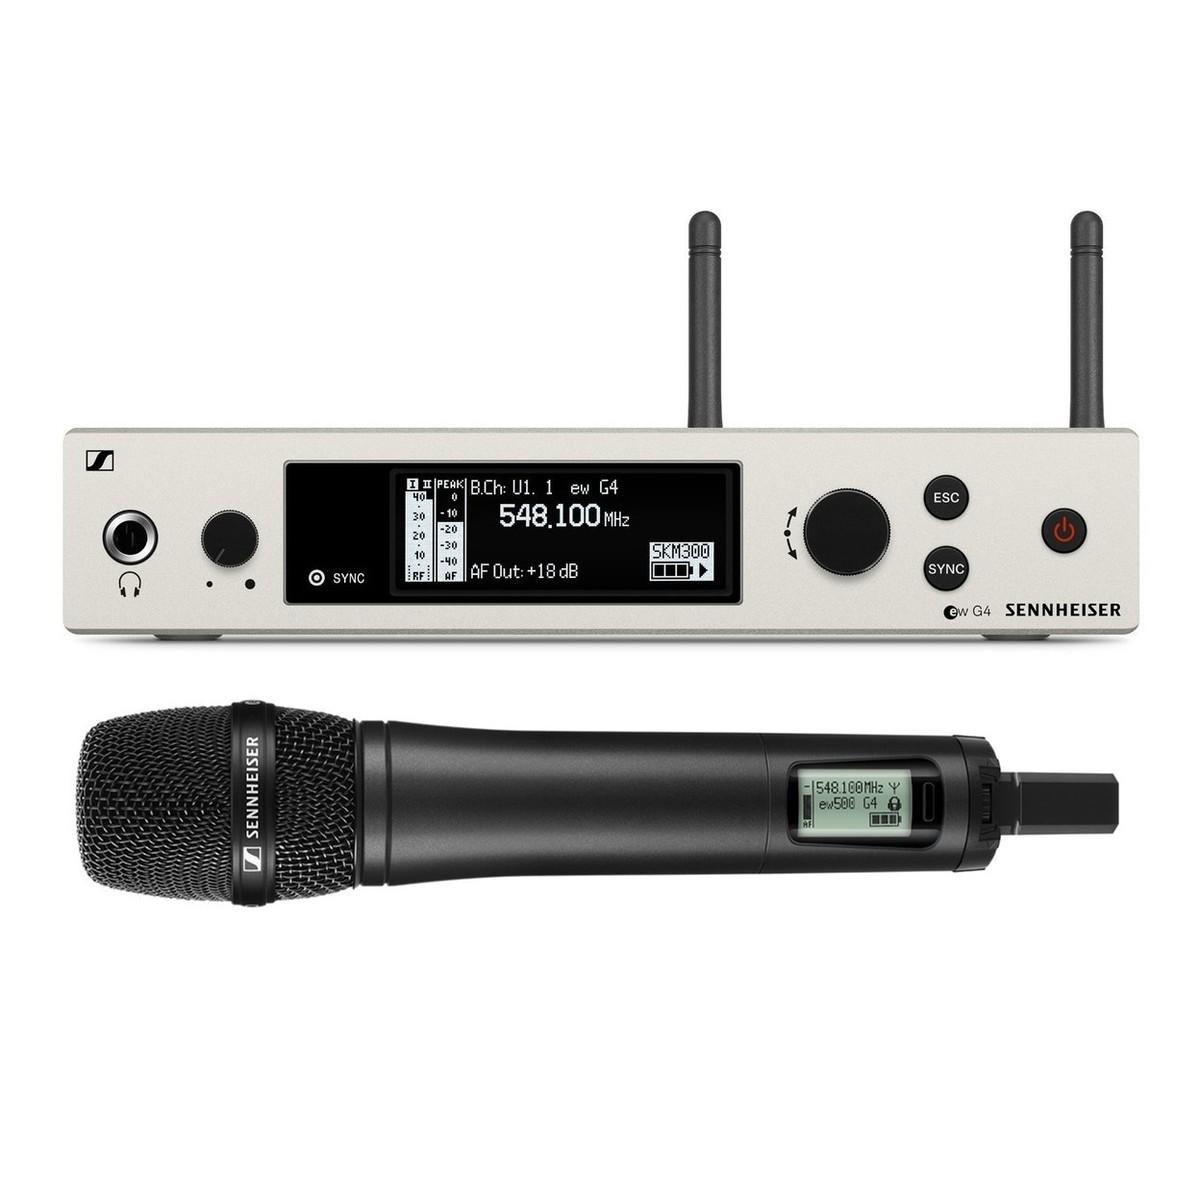 Sennheiser Ew 500 Wireless Microphone Receiver Musical Instruments & Gear